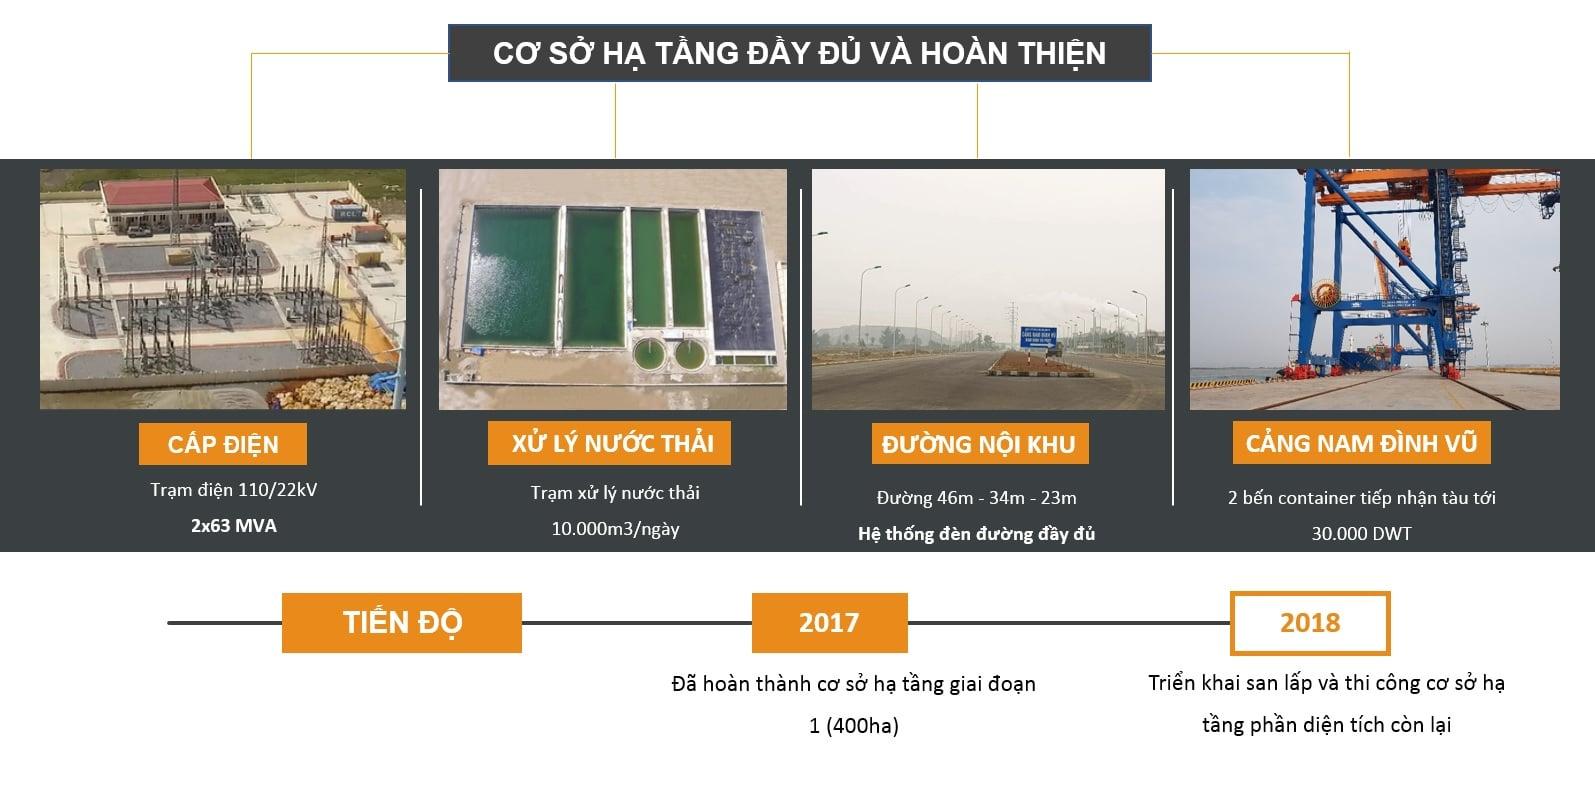 Khu Cong Nghiep Nam Dinh Vu Hai Phong 4